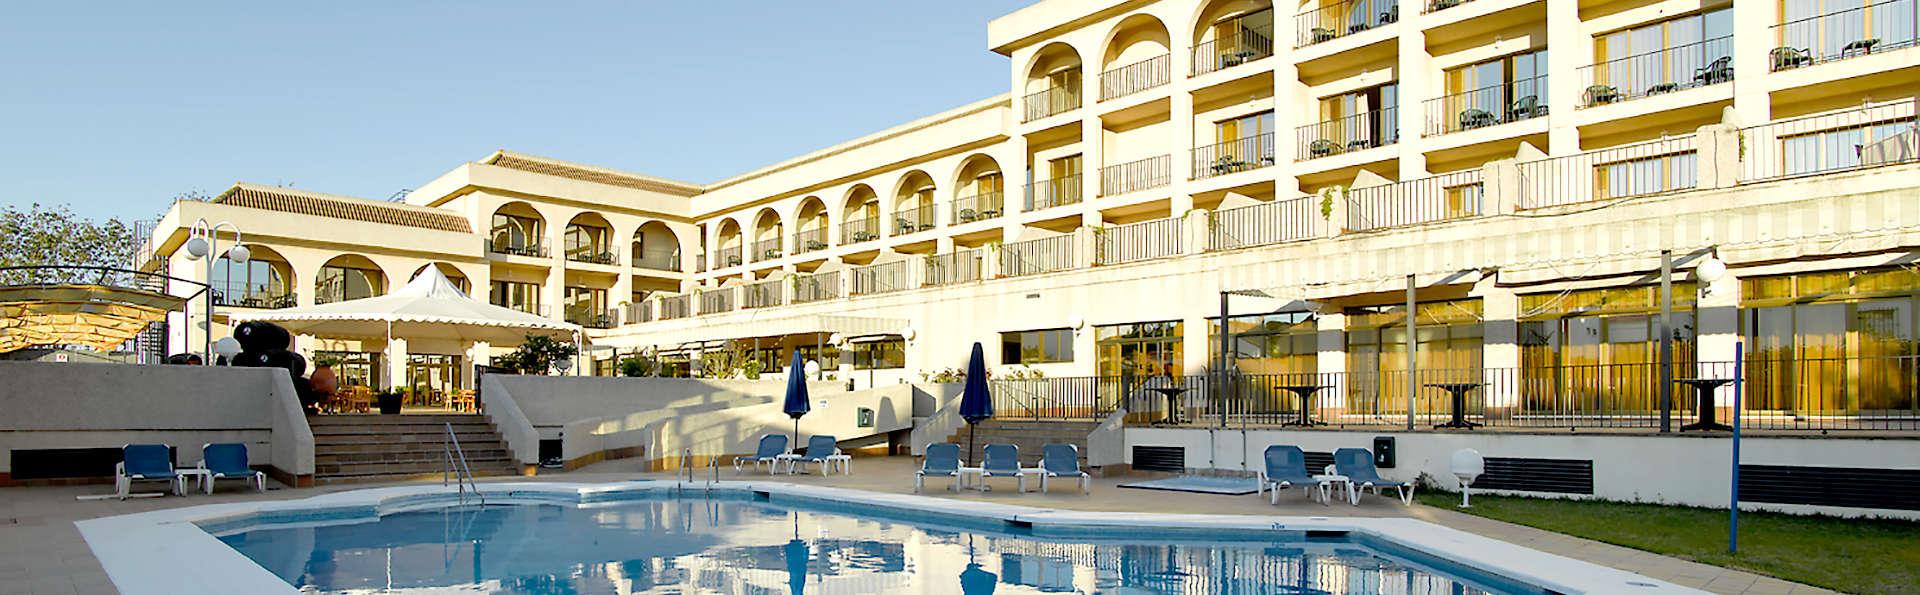 Hotel Macià Doñana  - Edit_Front.jpg